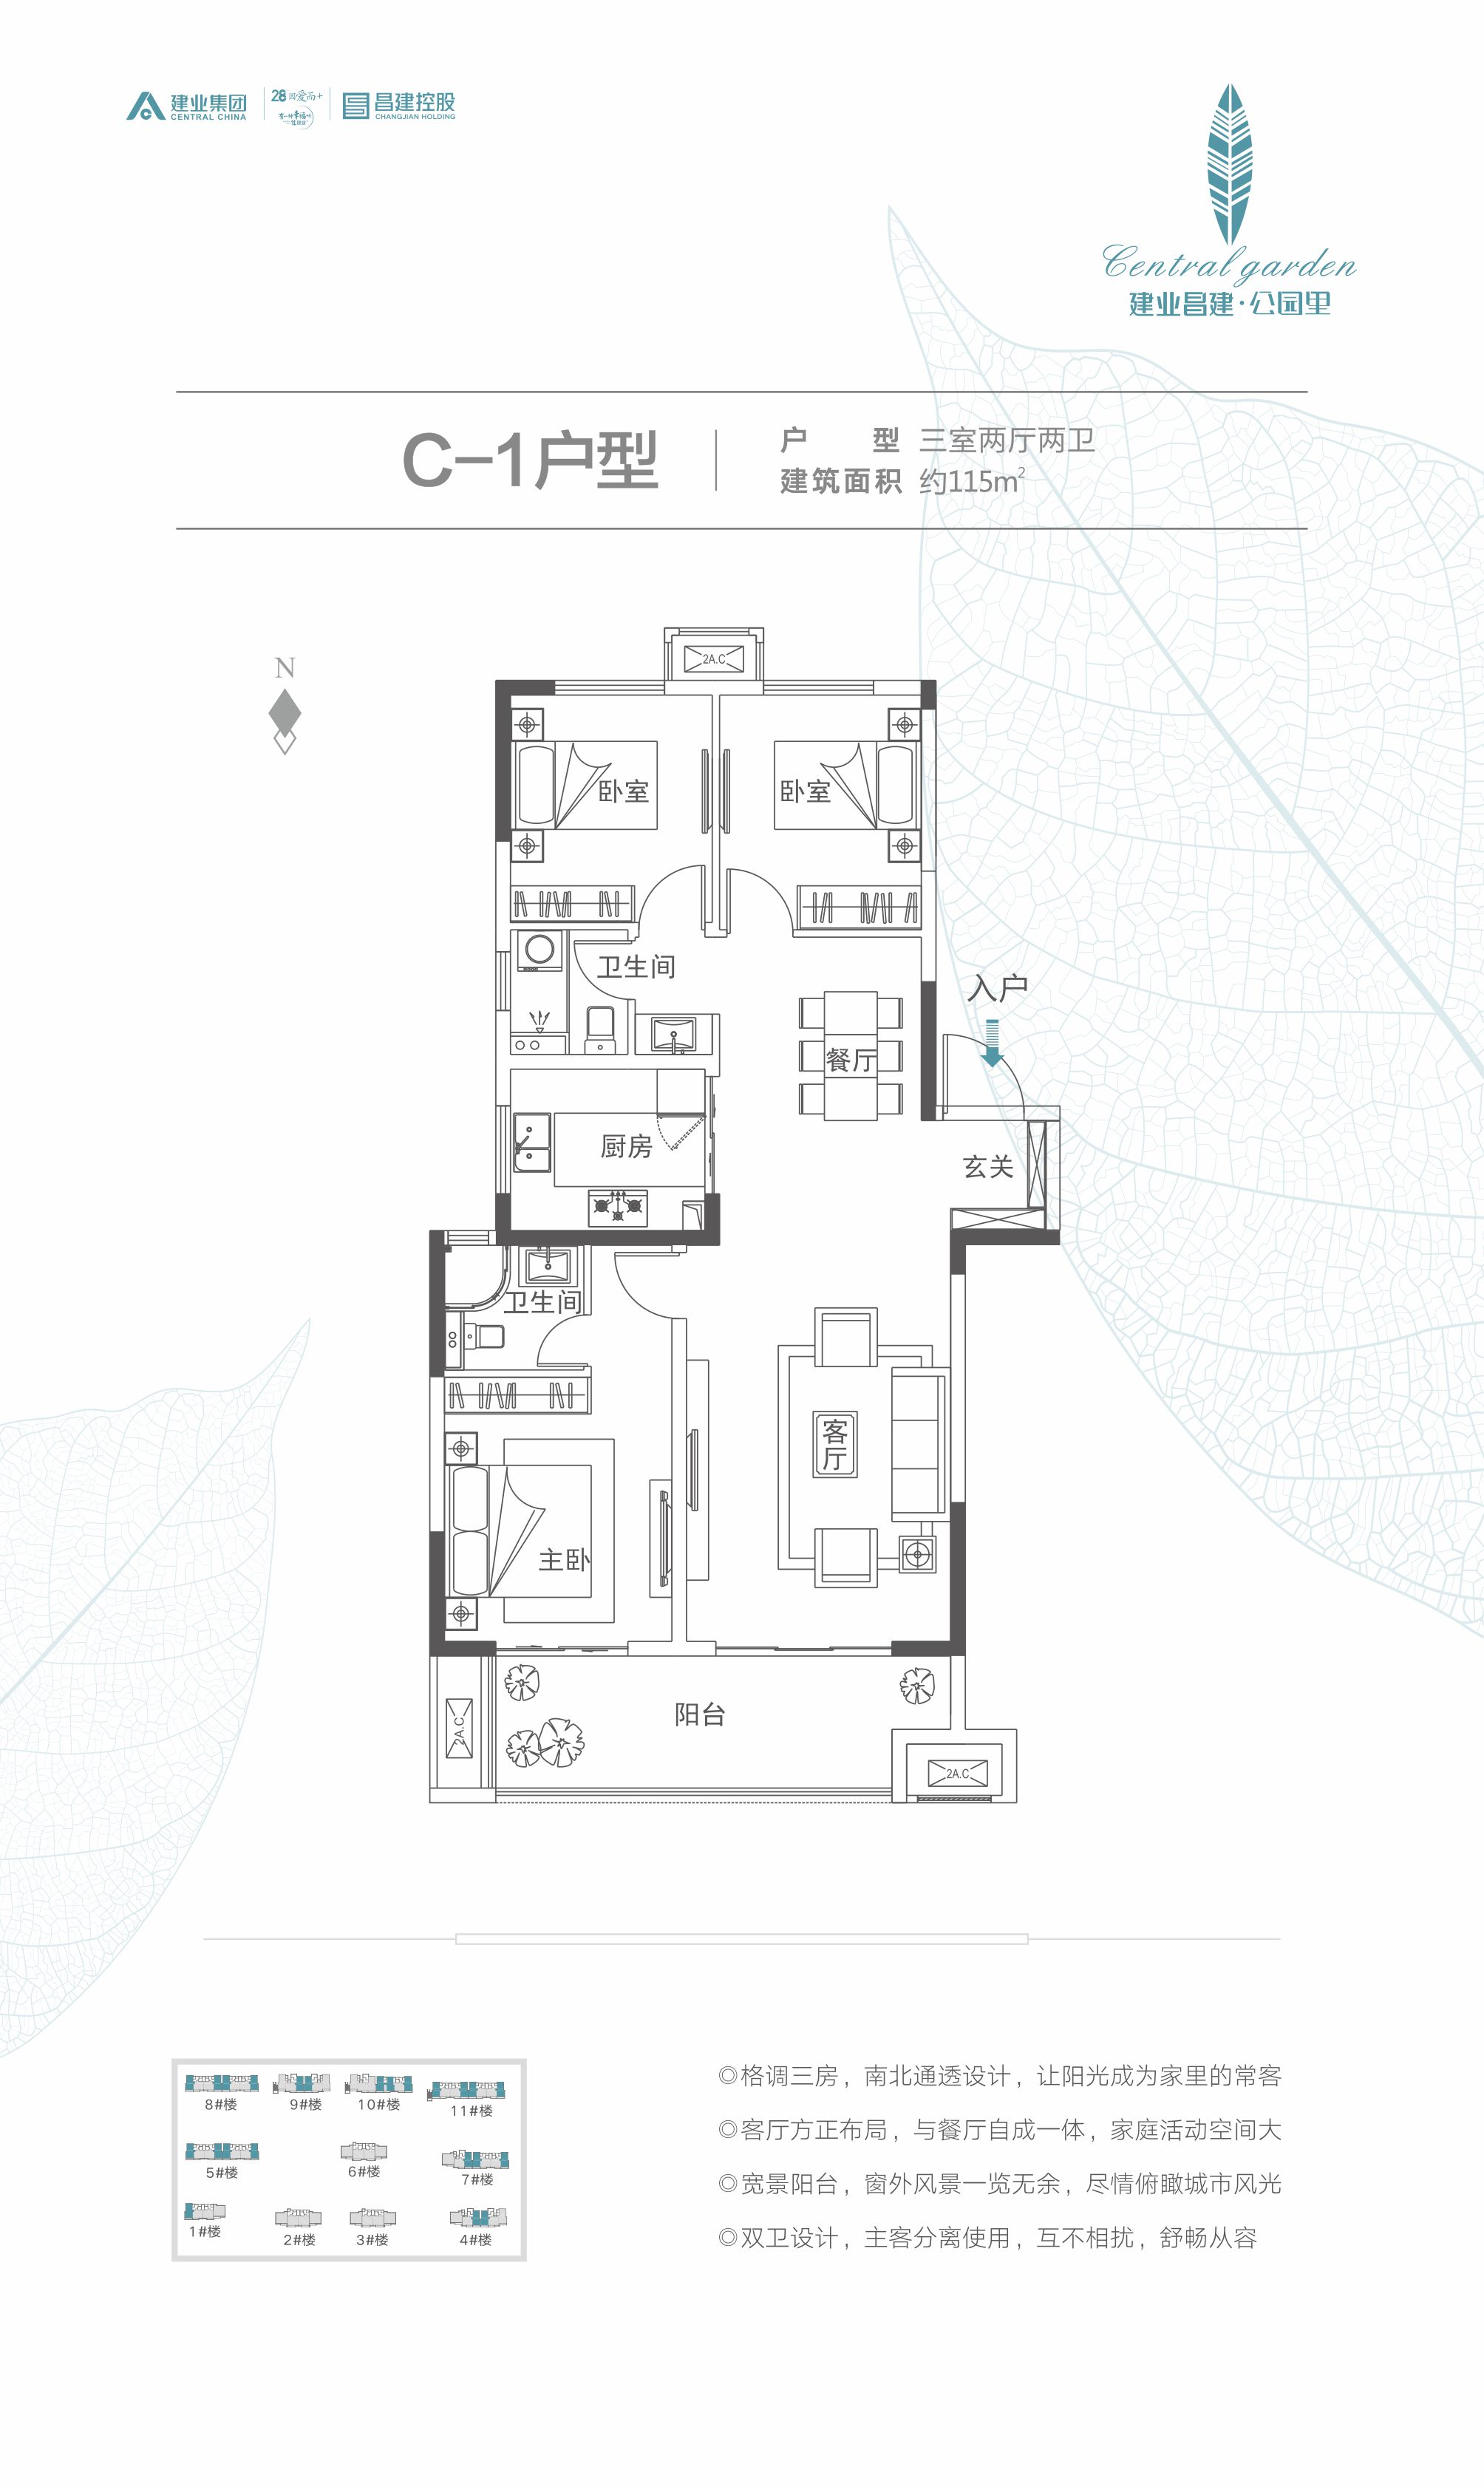 C-1建业昌建·公园里户型图